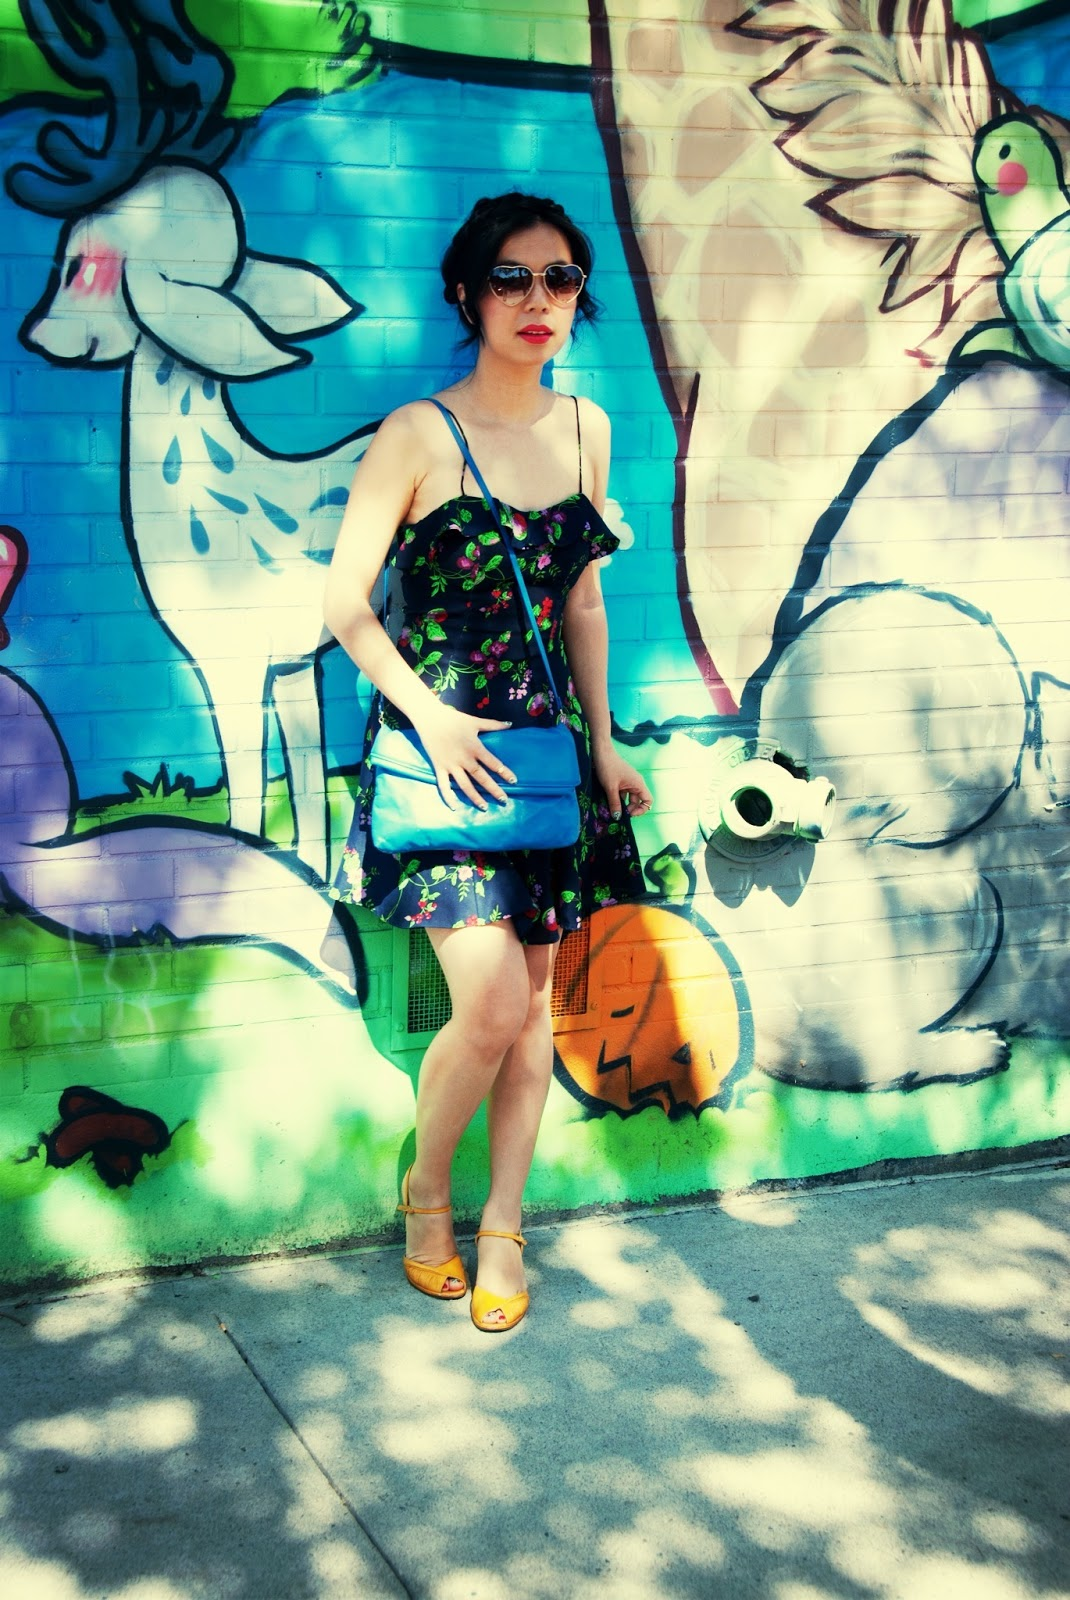 navy grape dress heart sunglasses graffiti blue purse yellow vintage sandals